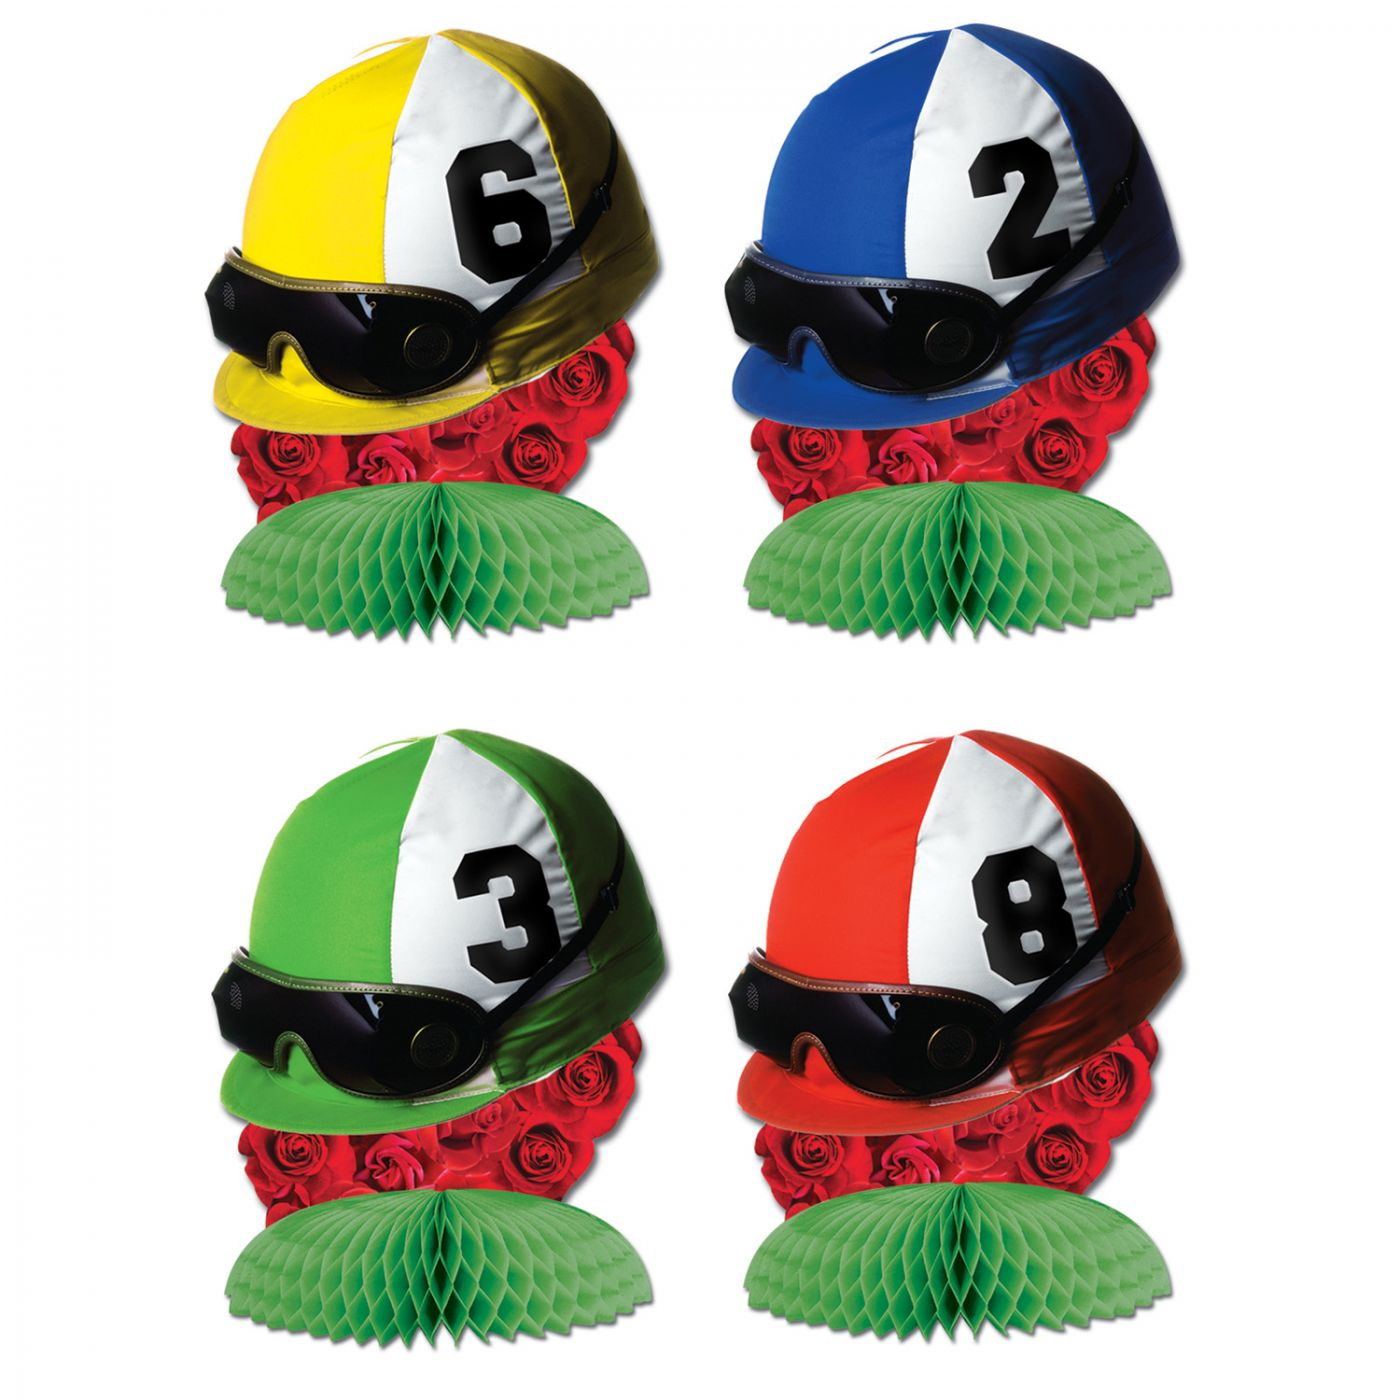 Image of Jockey Helmet Centerpieces